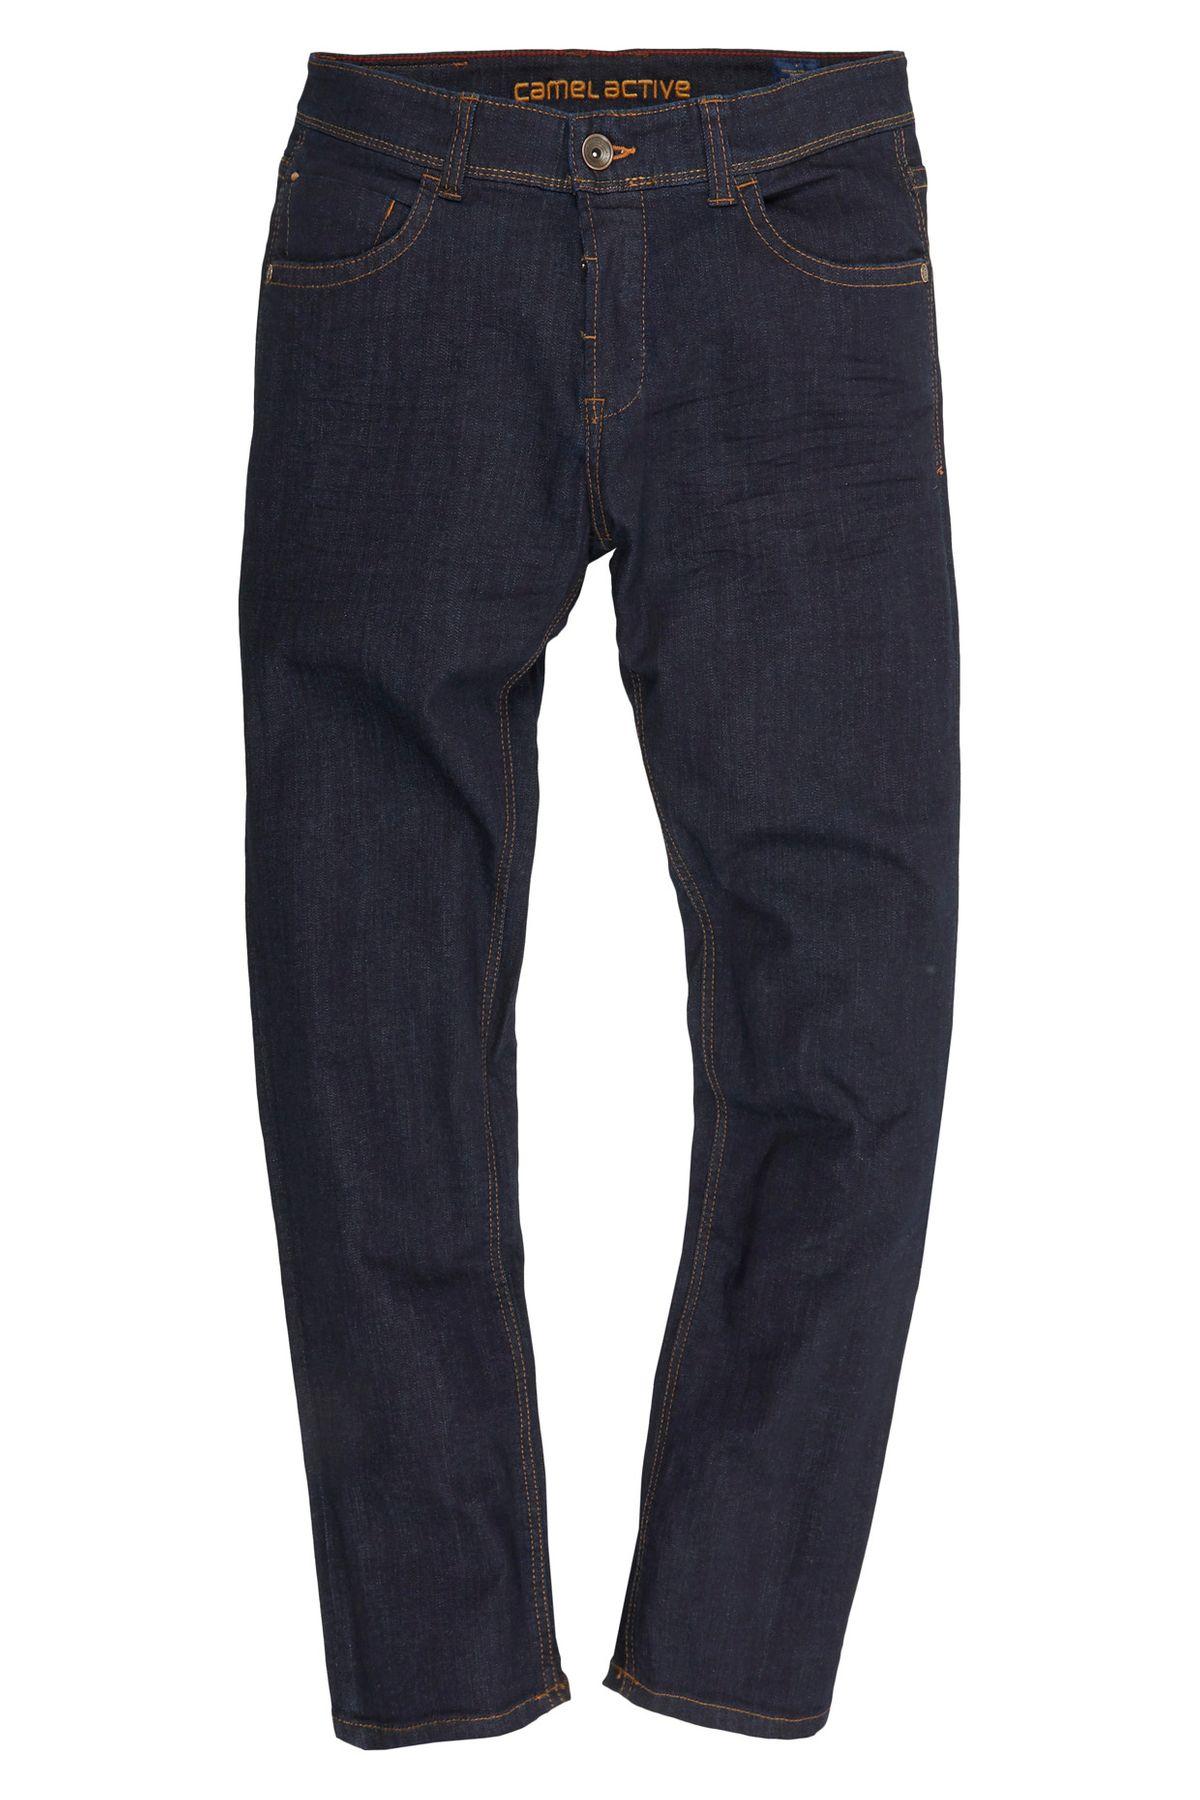 Camel Active - Herren Jeans 5-Pocket Houston (9887-488405)